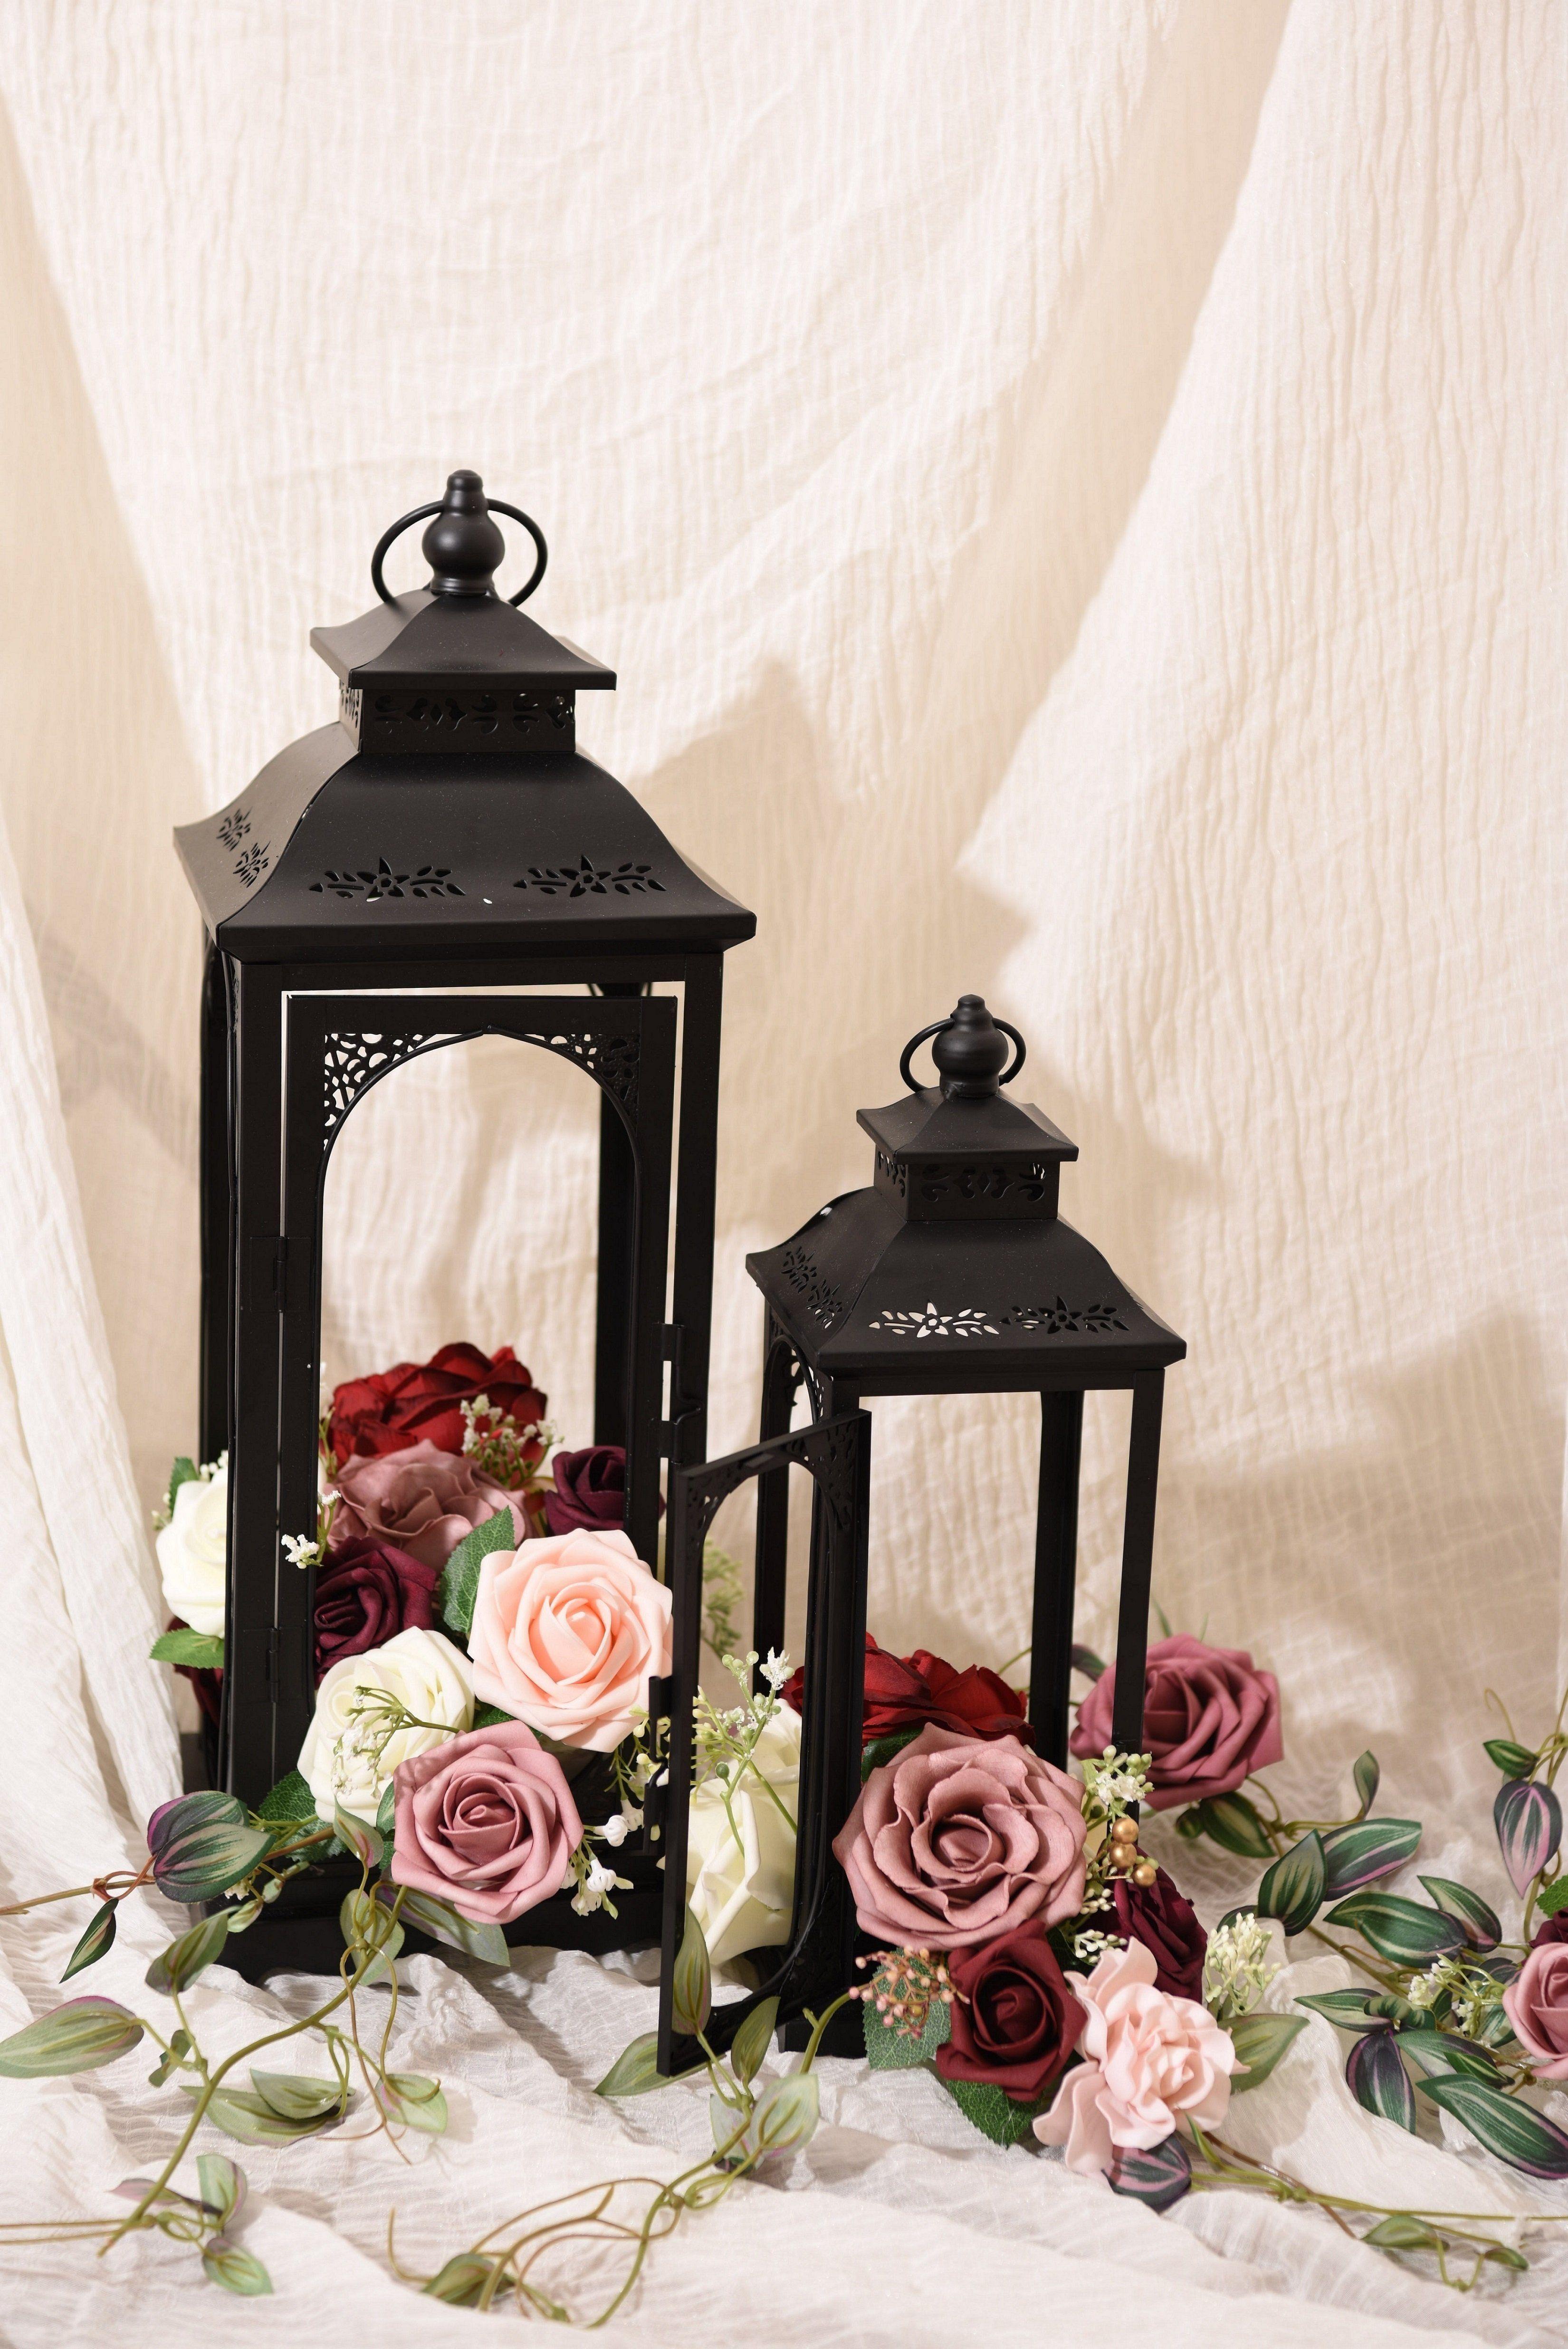 Dusty Rose Flowers Box Set 22 Styles In 2020 Burgundy Wedding Centerpieces Vintage Wedding Decorations Dusty Rose Wedding